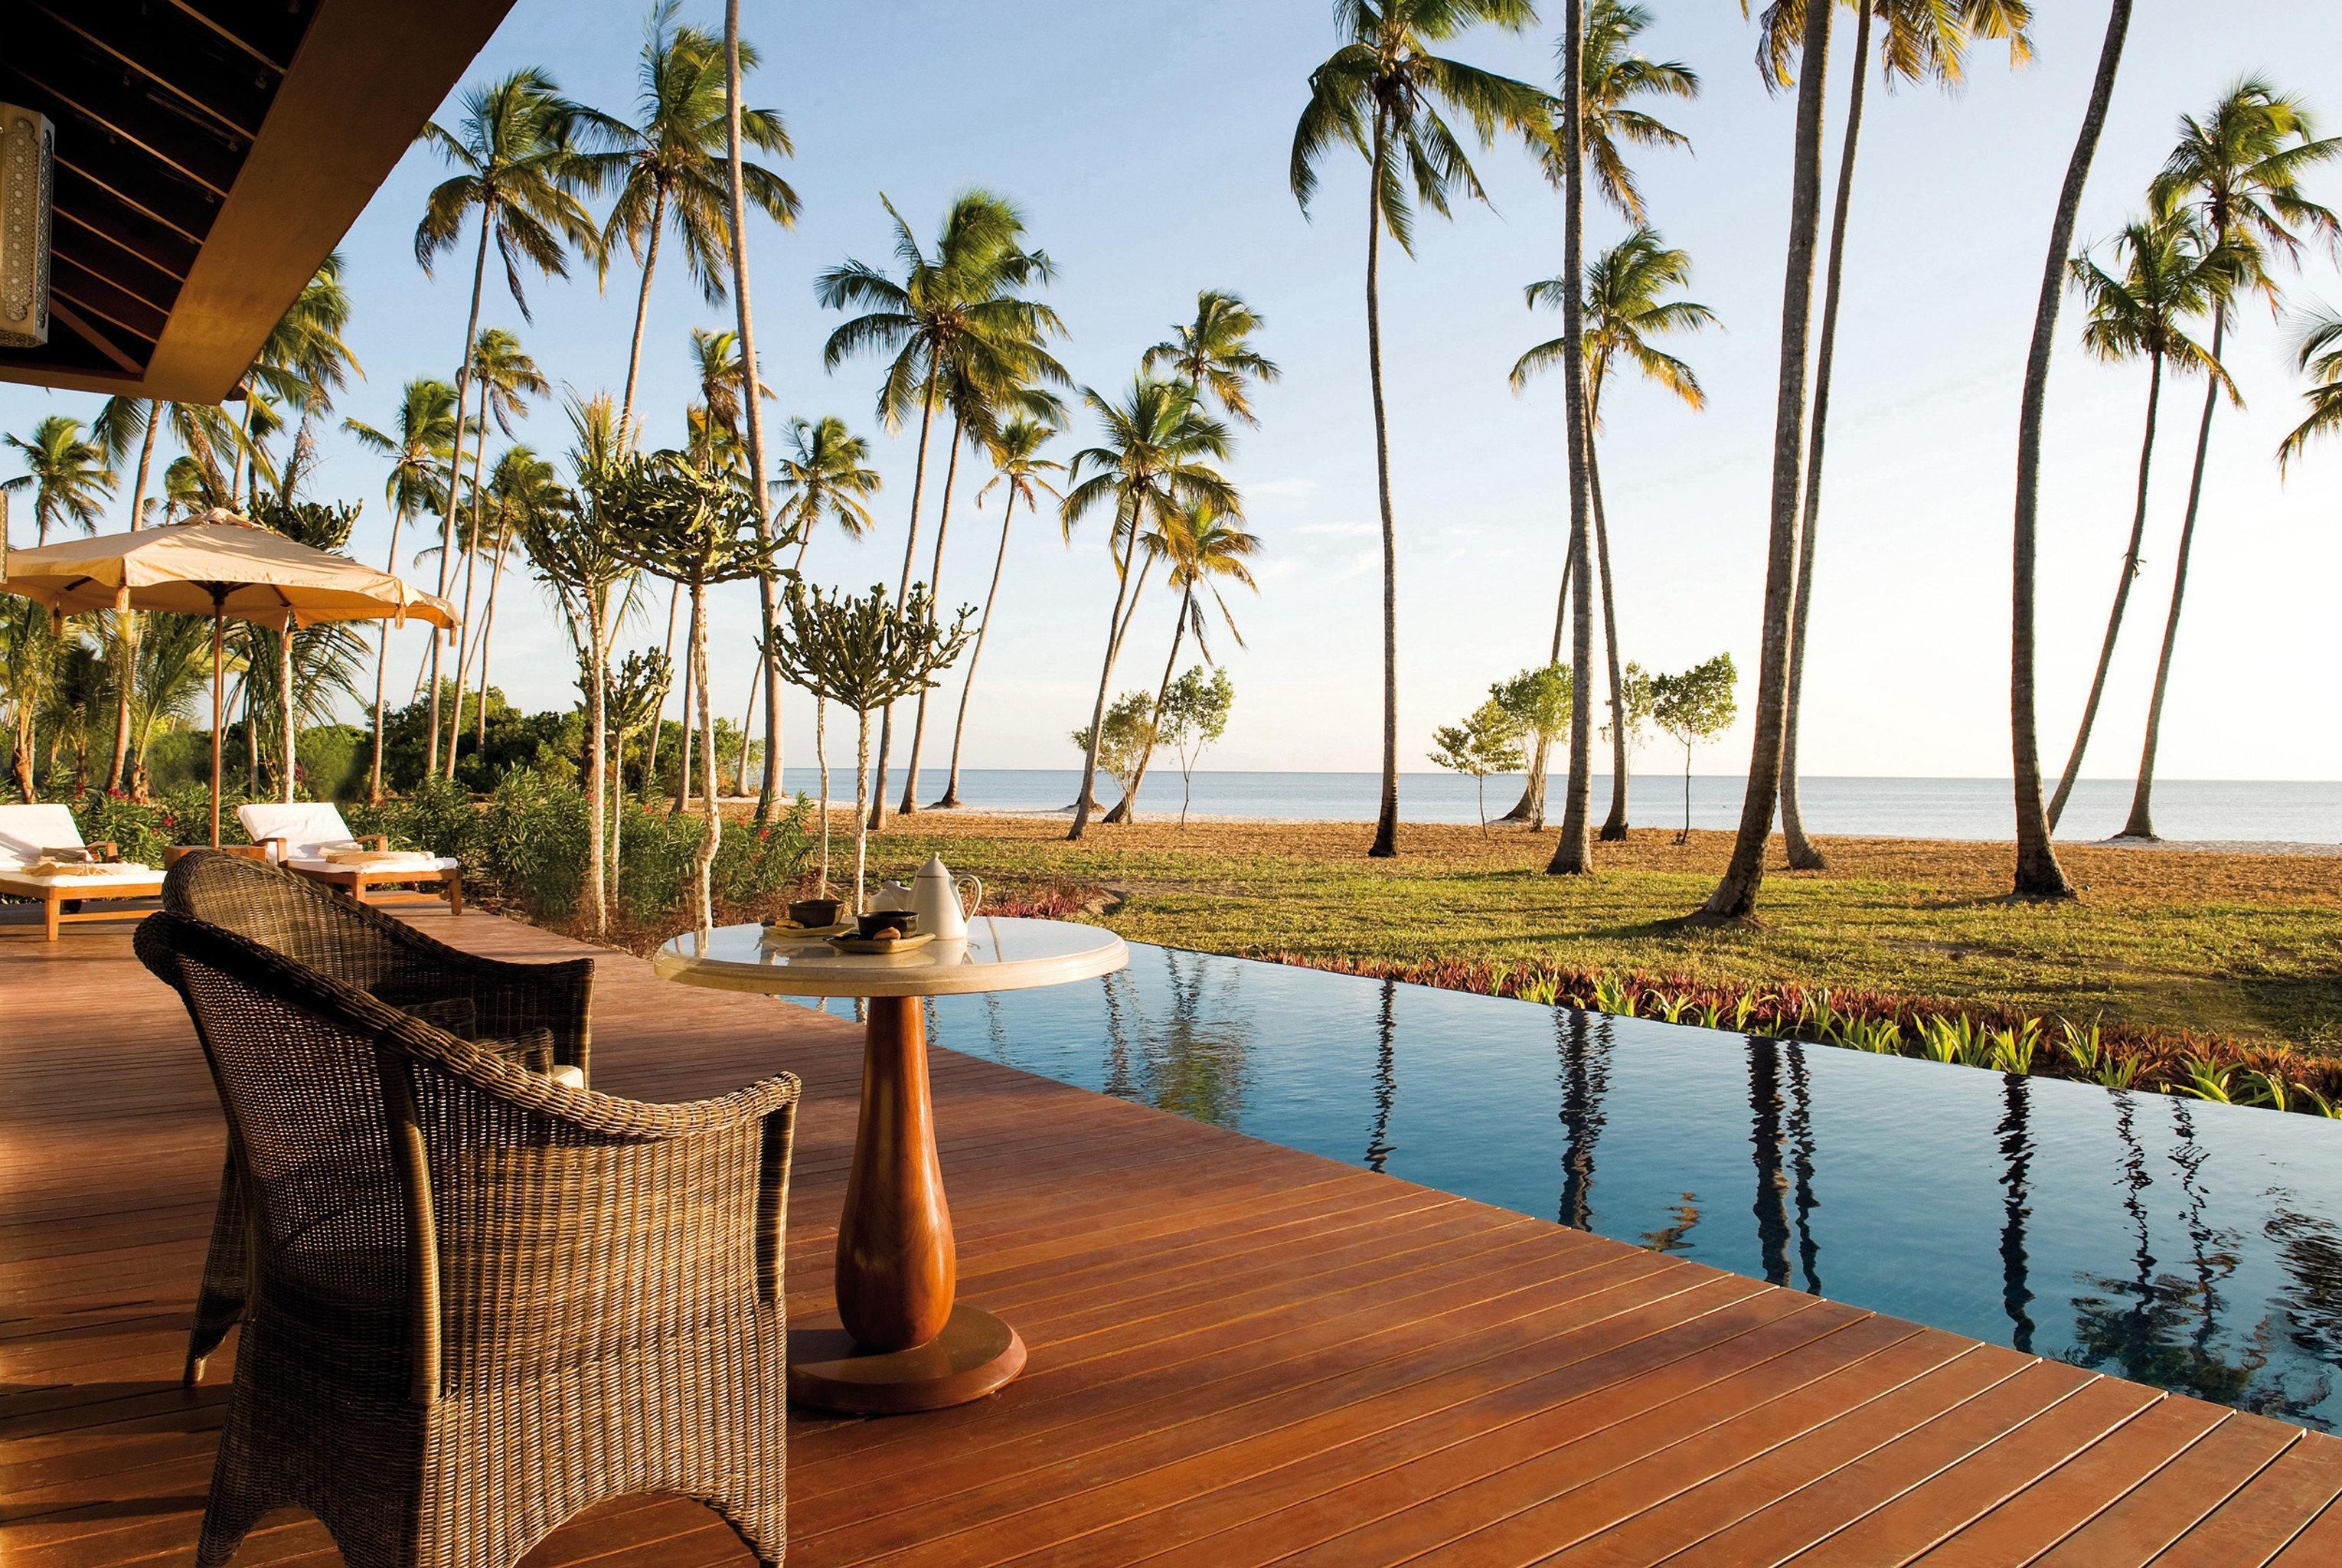 Beachfront Family Luxury Patio Pool Resort Scenic views sky palm leisure property arecales swimming pool home Villa caribbean condominium lined